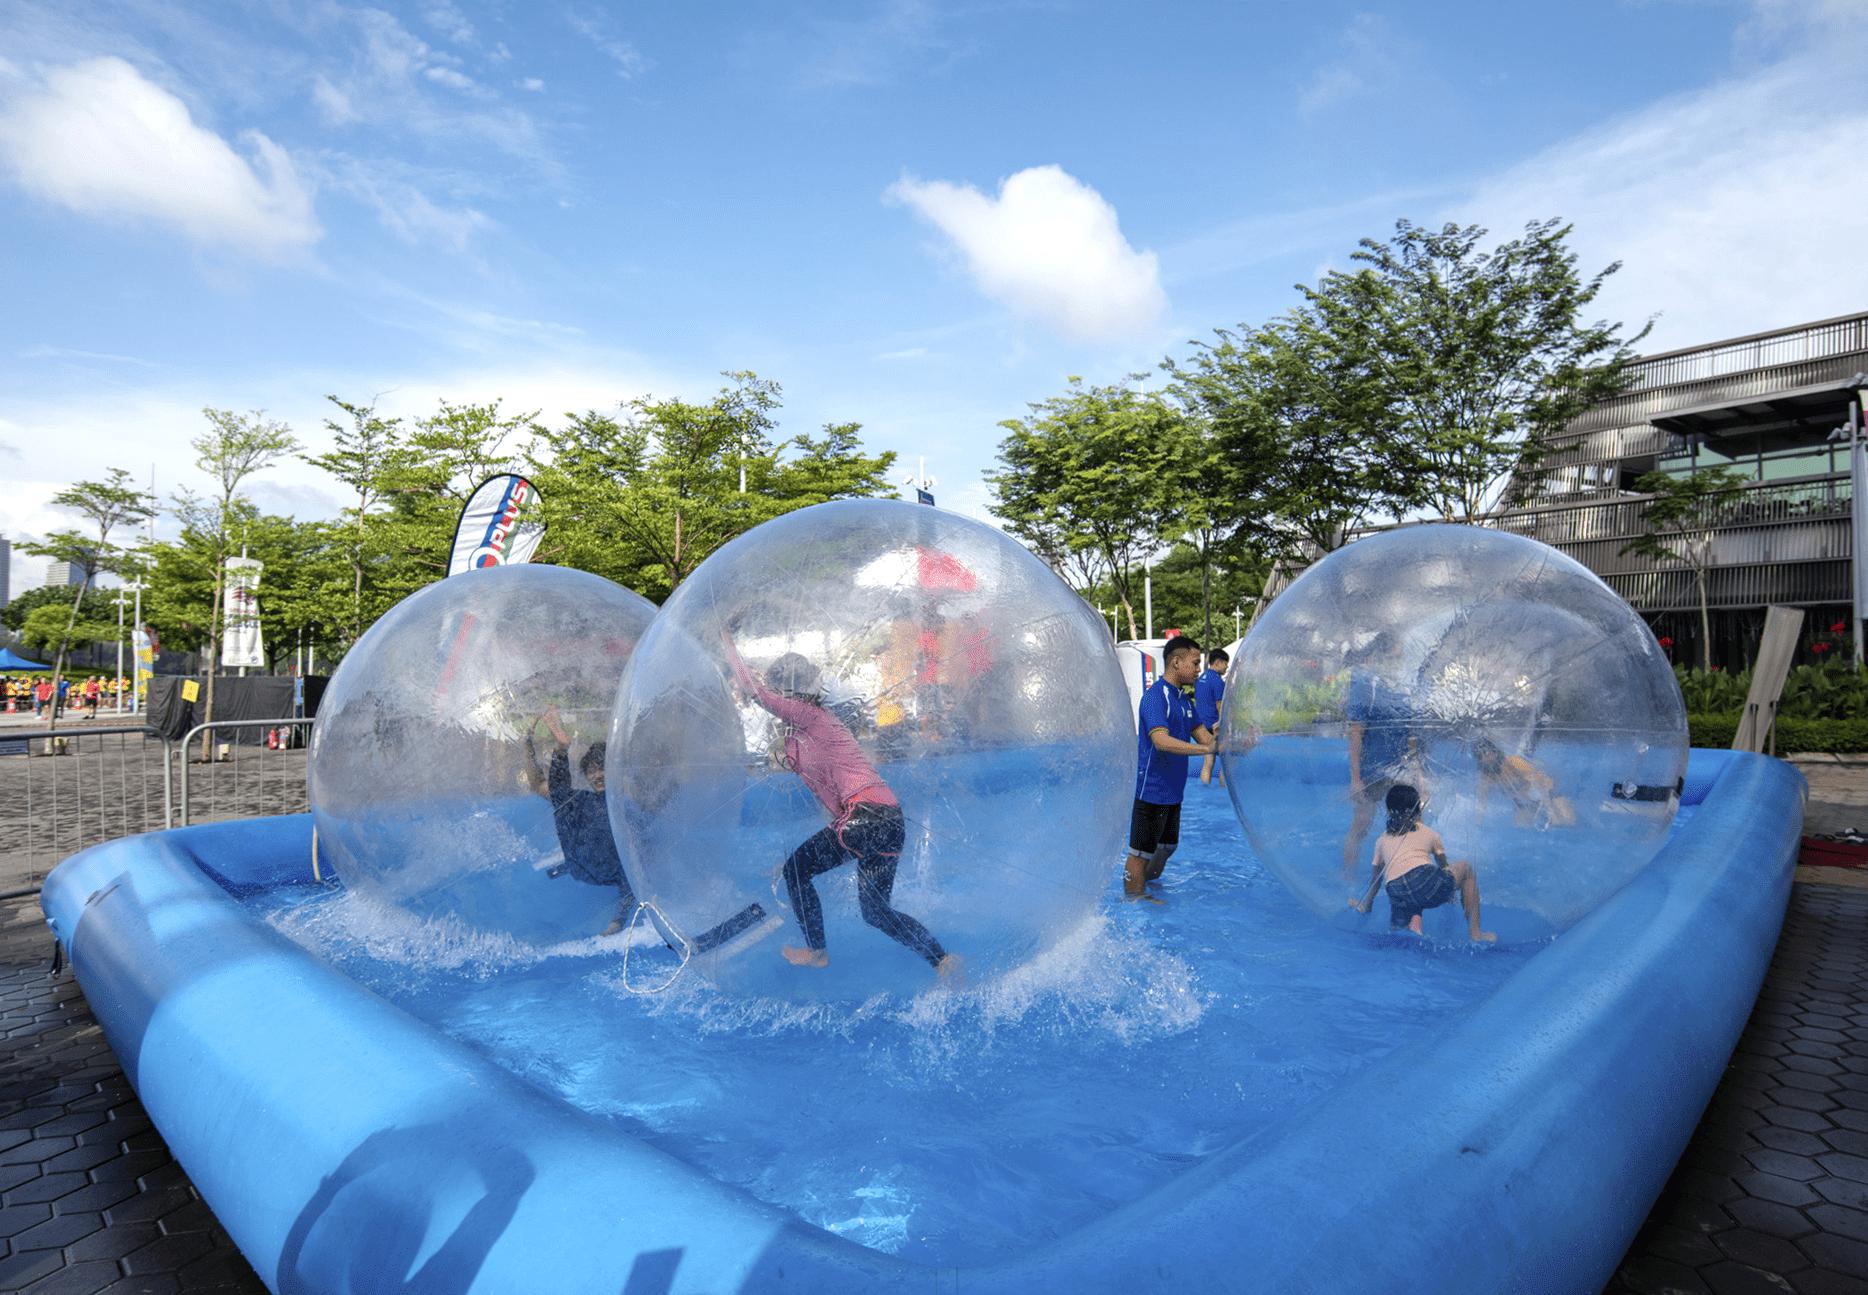 Singapore Sports Hub Summer Sports Jam Bubble Run Water Playzone